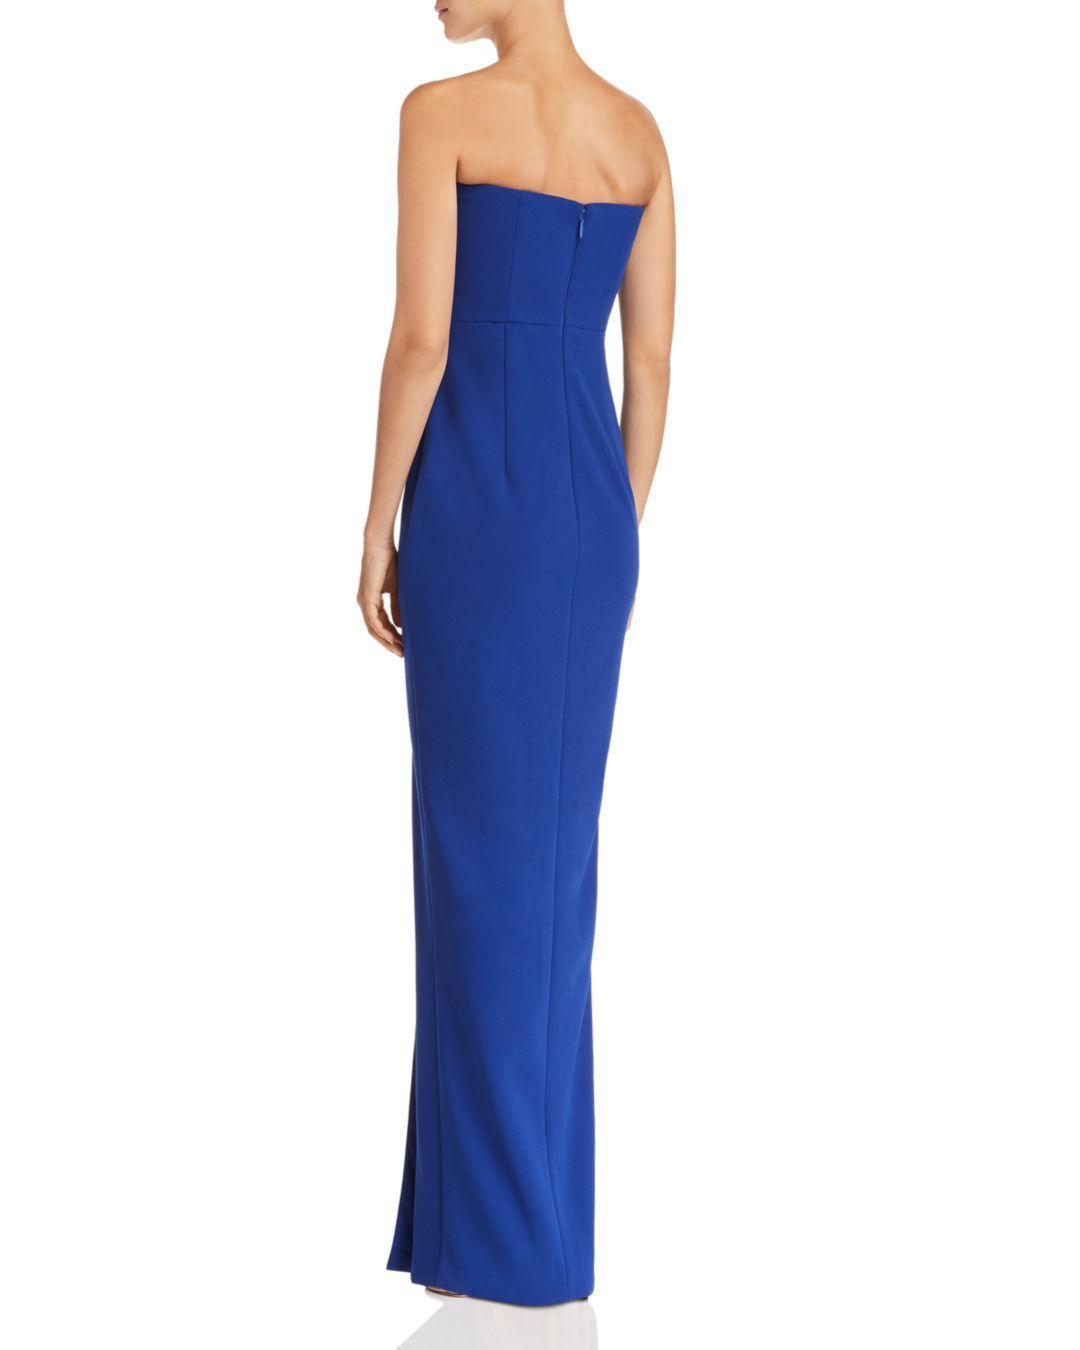 e765da71b9c0 Lyst - Bariano Strapless Column Gown in Blue